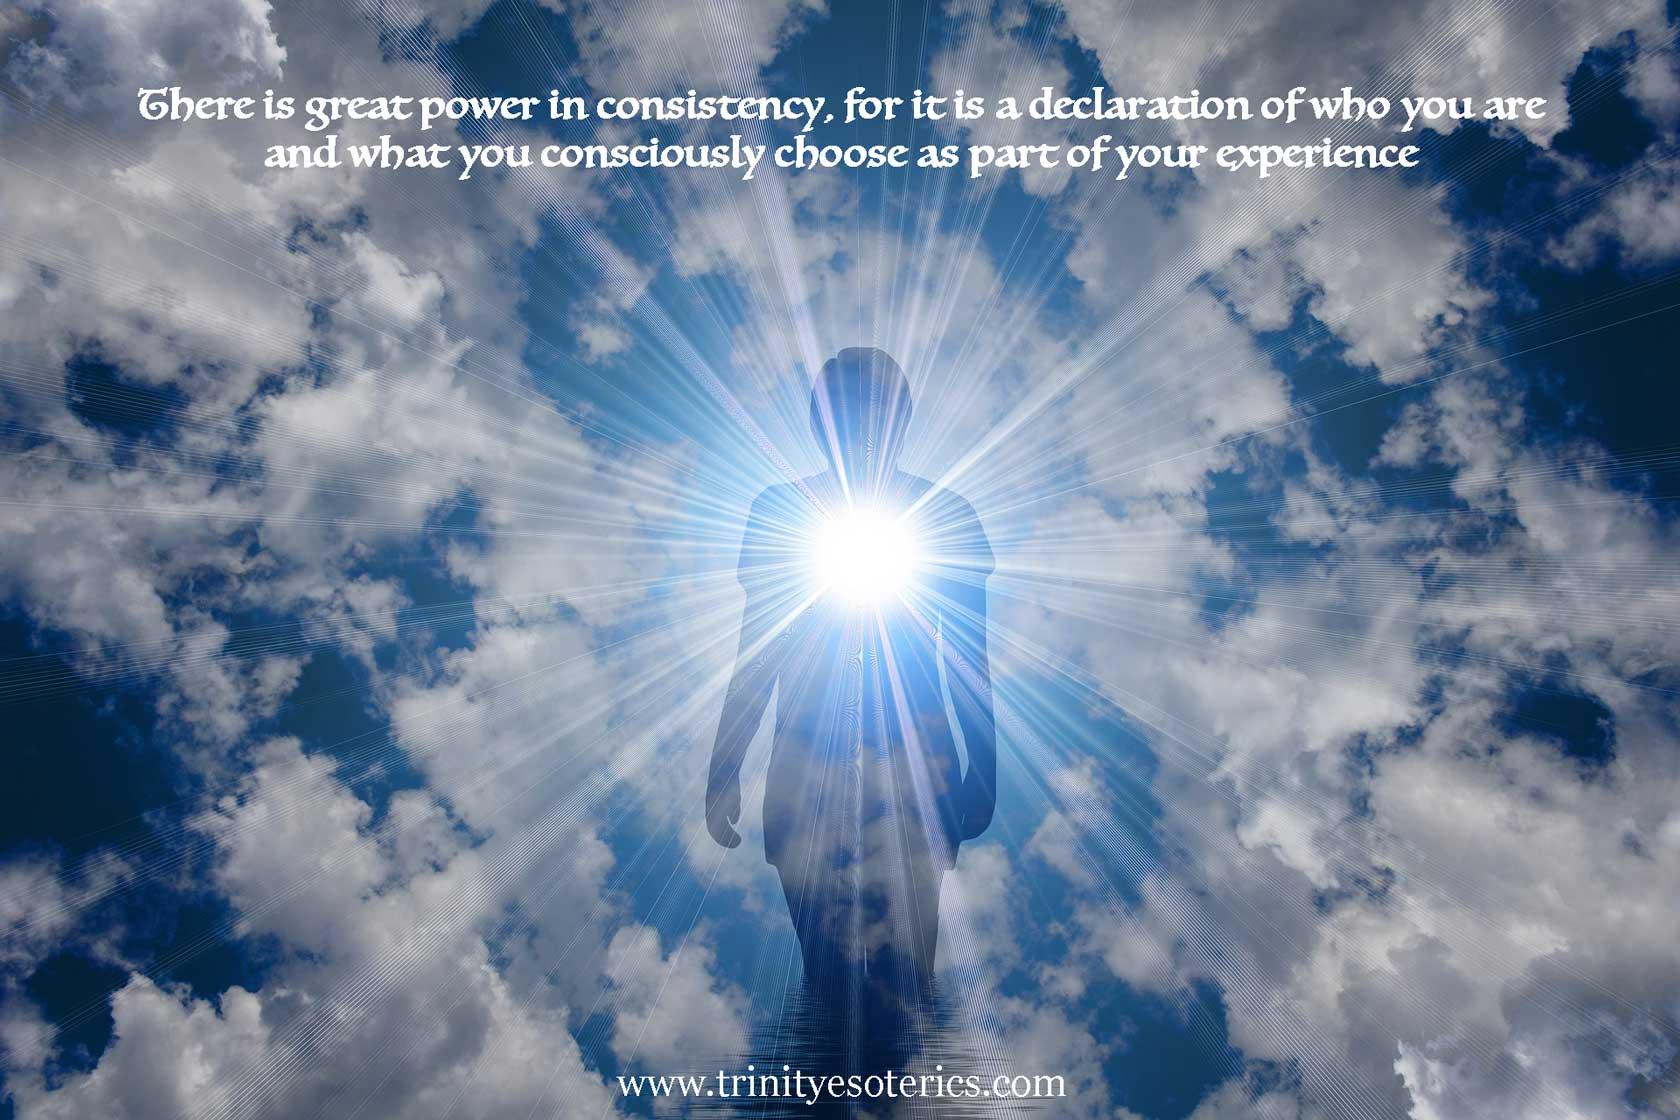 person of light trinity esoterics